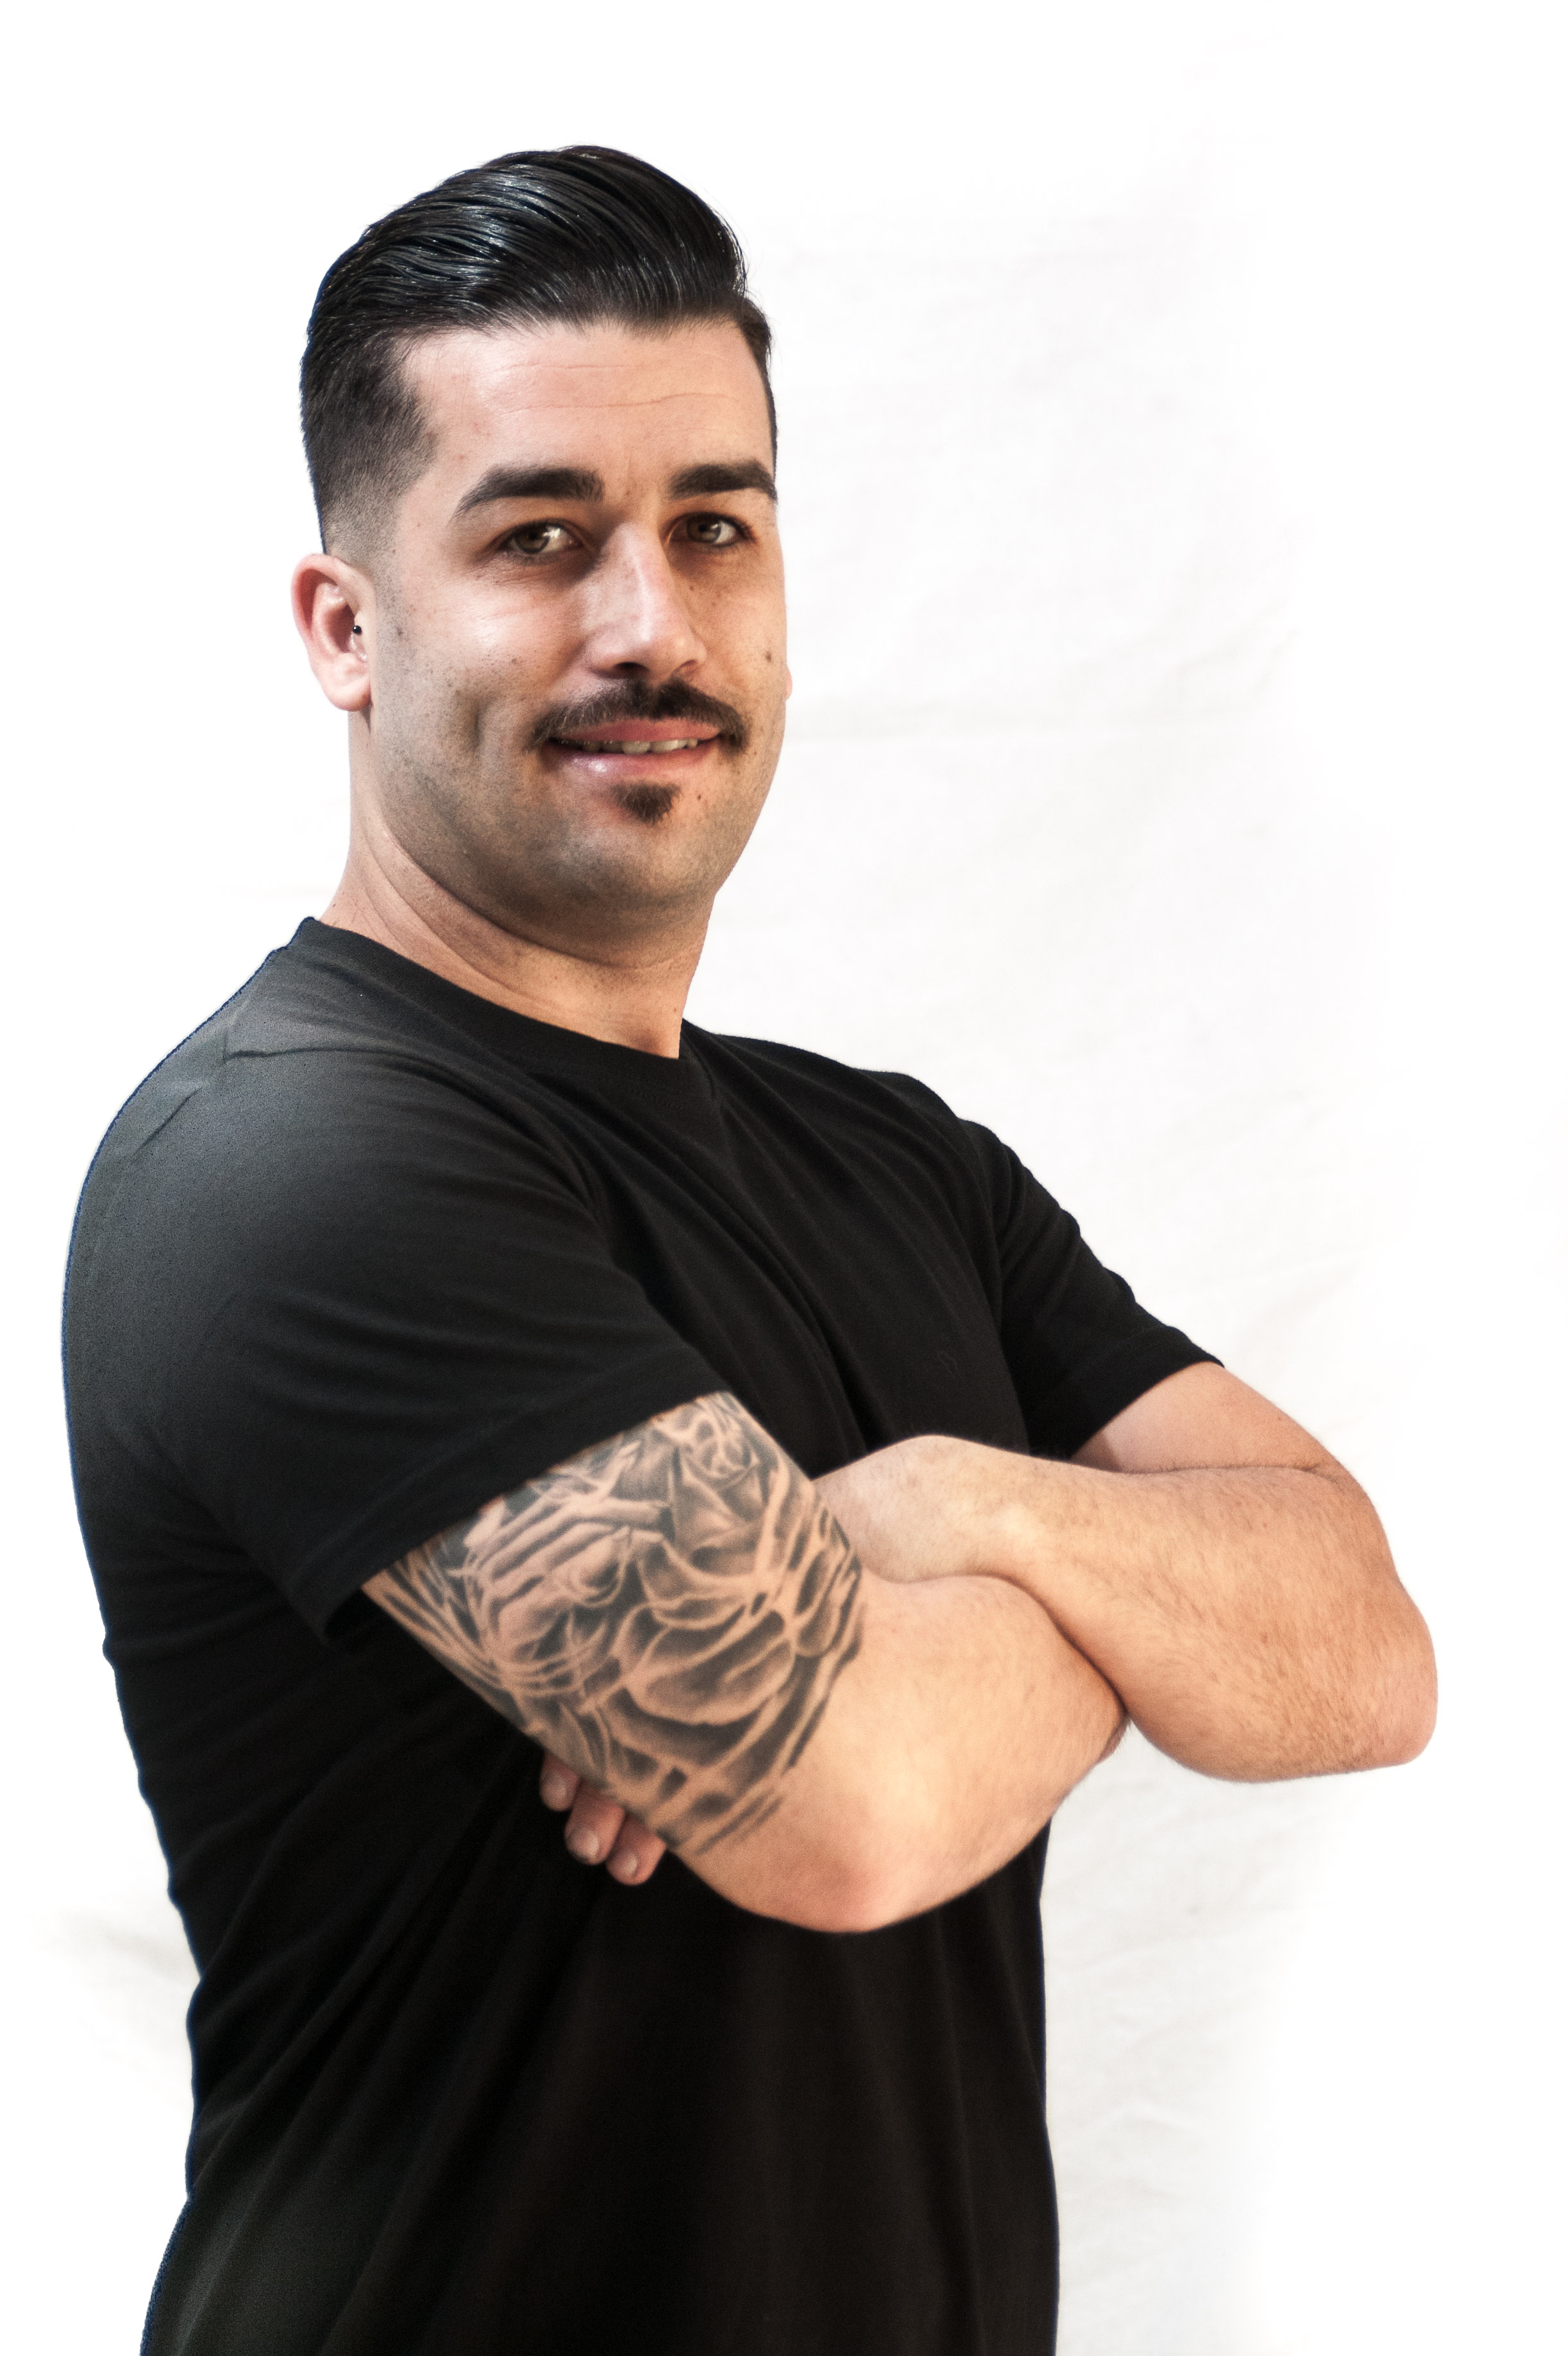 Besay Castro Betancor